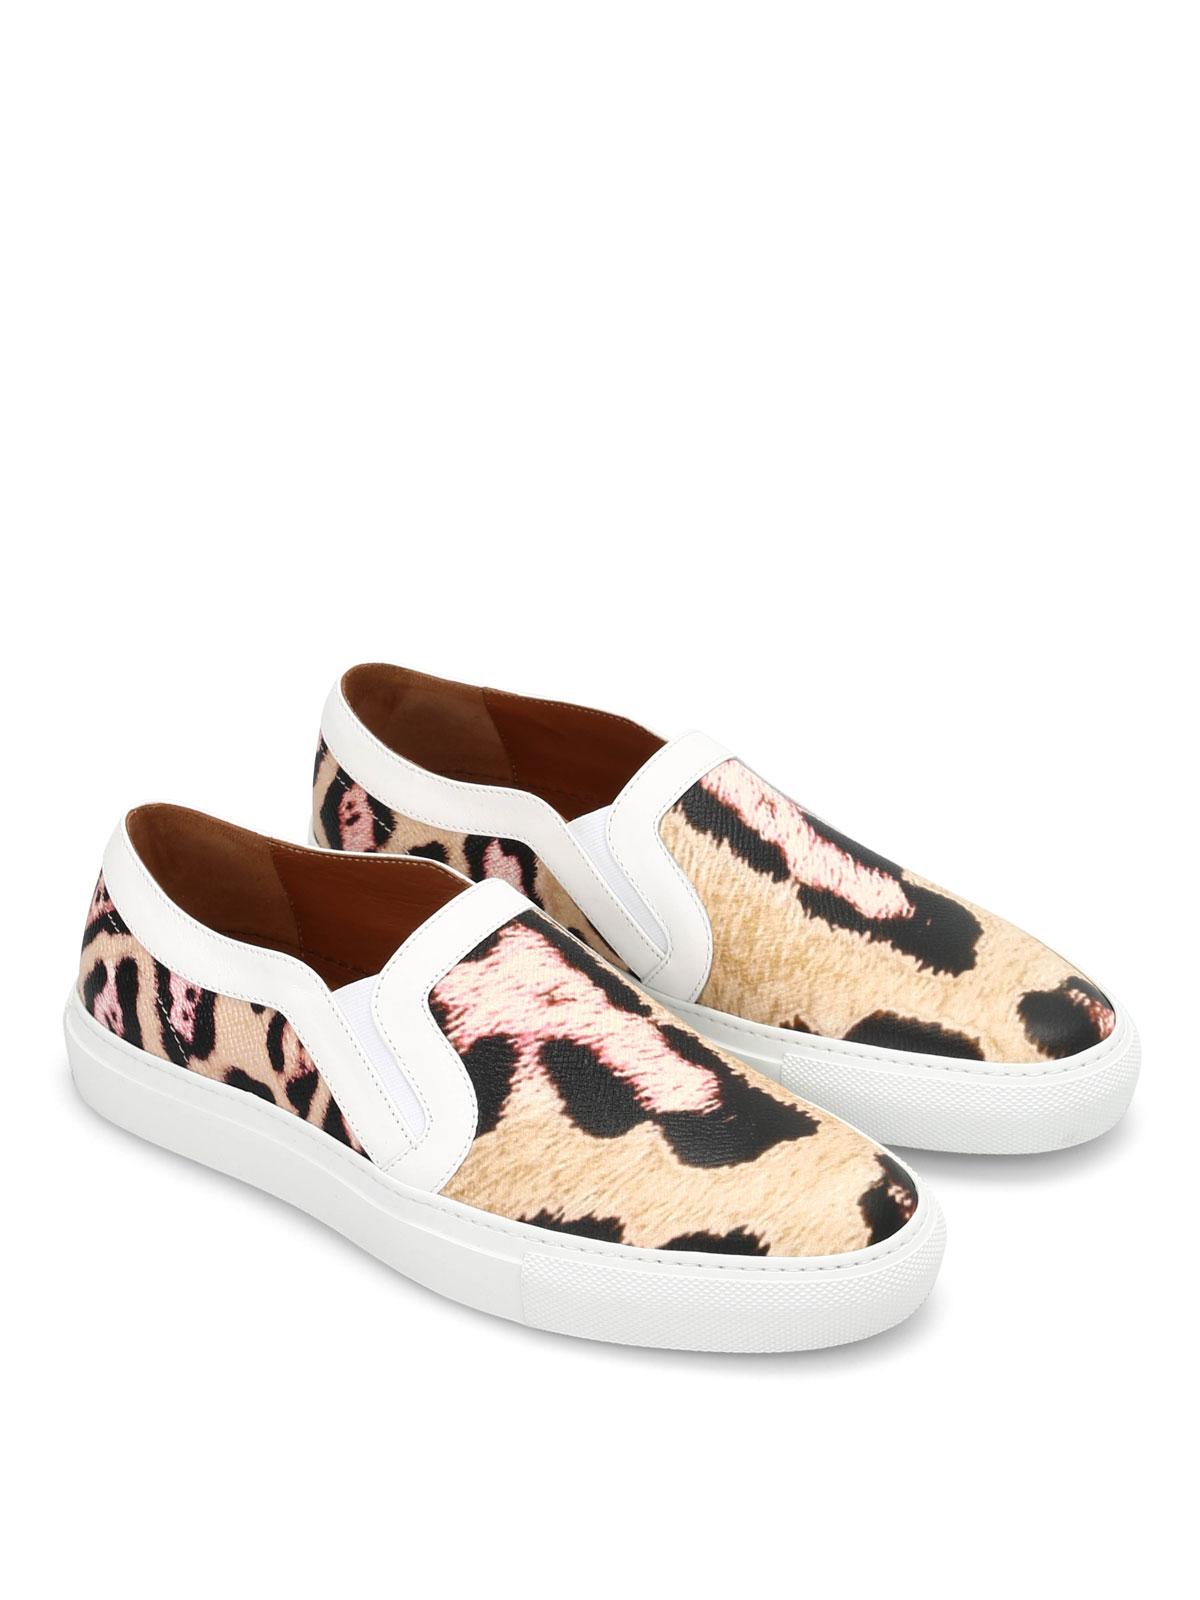 8c3ee250df2 Givenchy - Skate leopard slip-ons - Mocassins   Chaussures bateau ...